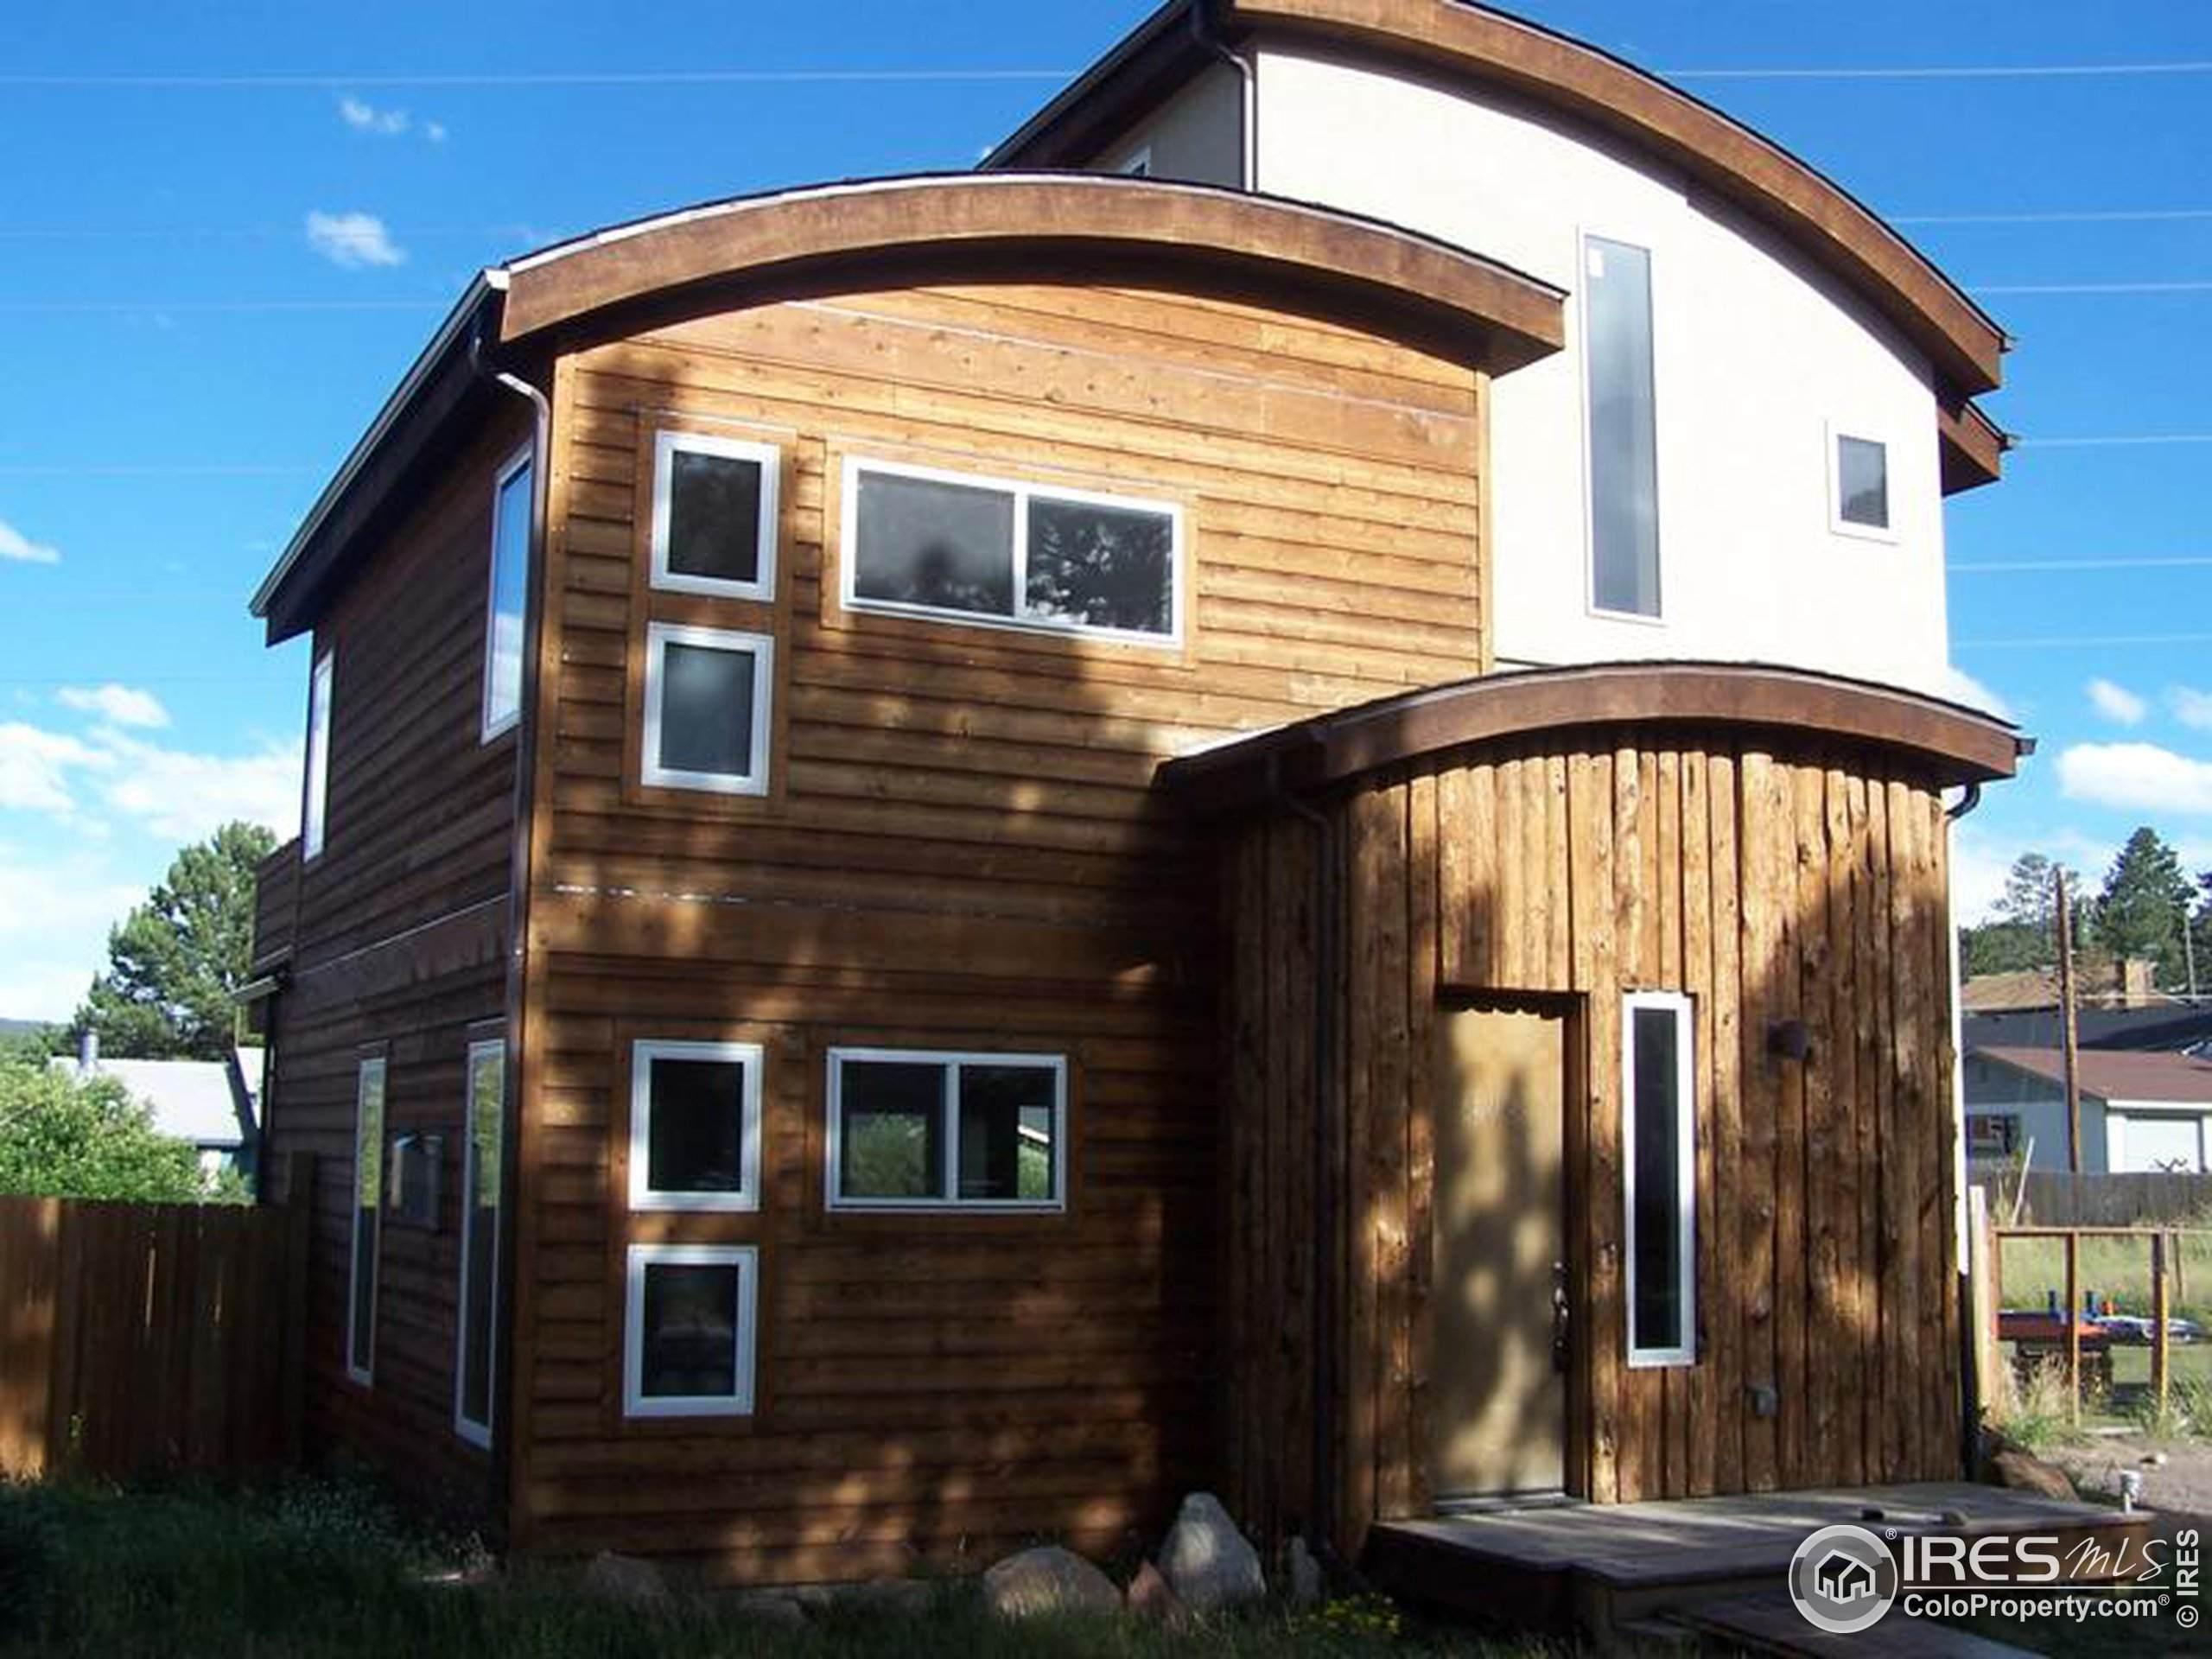 1567 Sierra Plaza St, Severance, CO 80550 (#938983) :: Mile High Luxury Real Estate